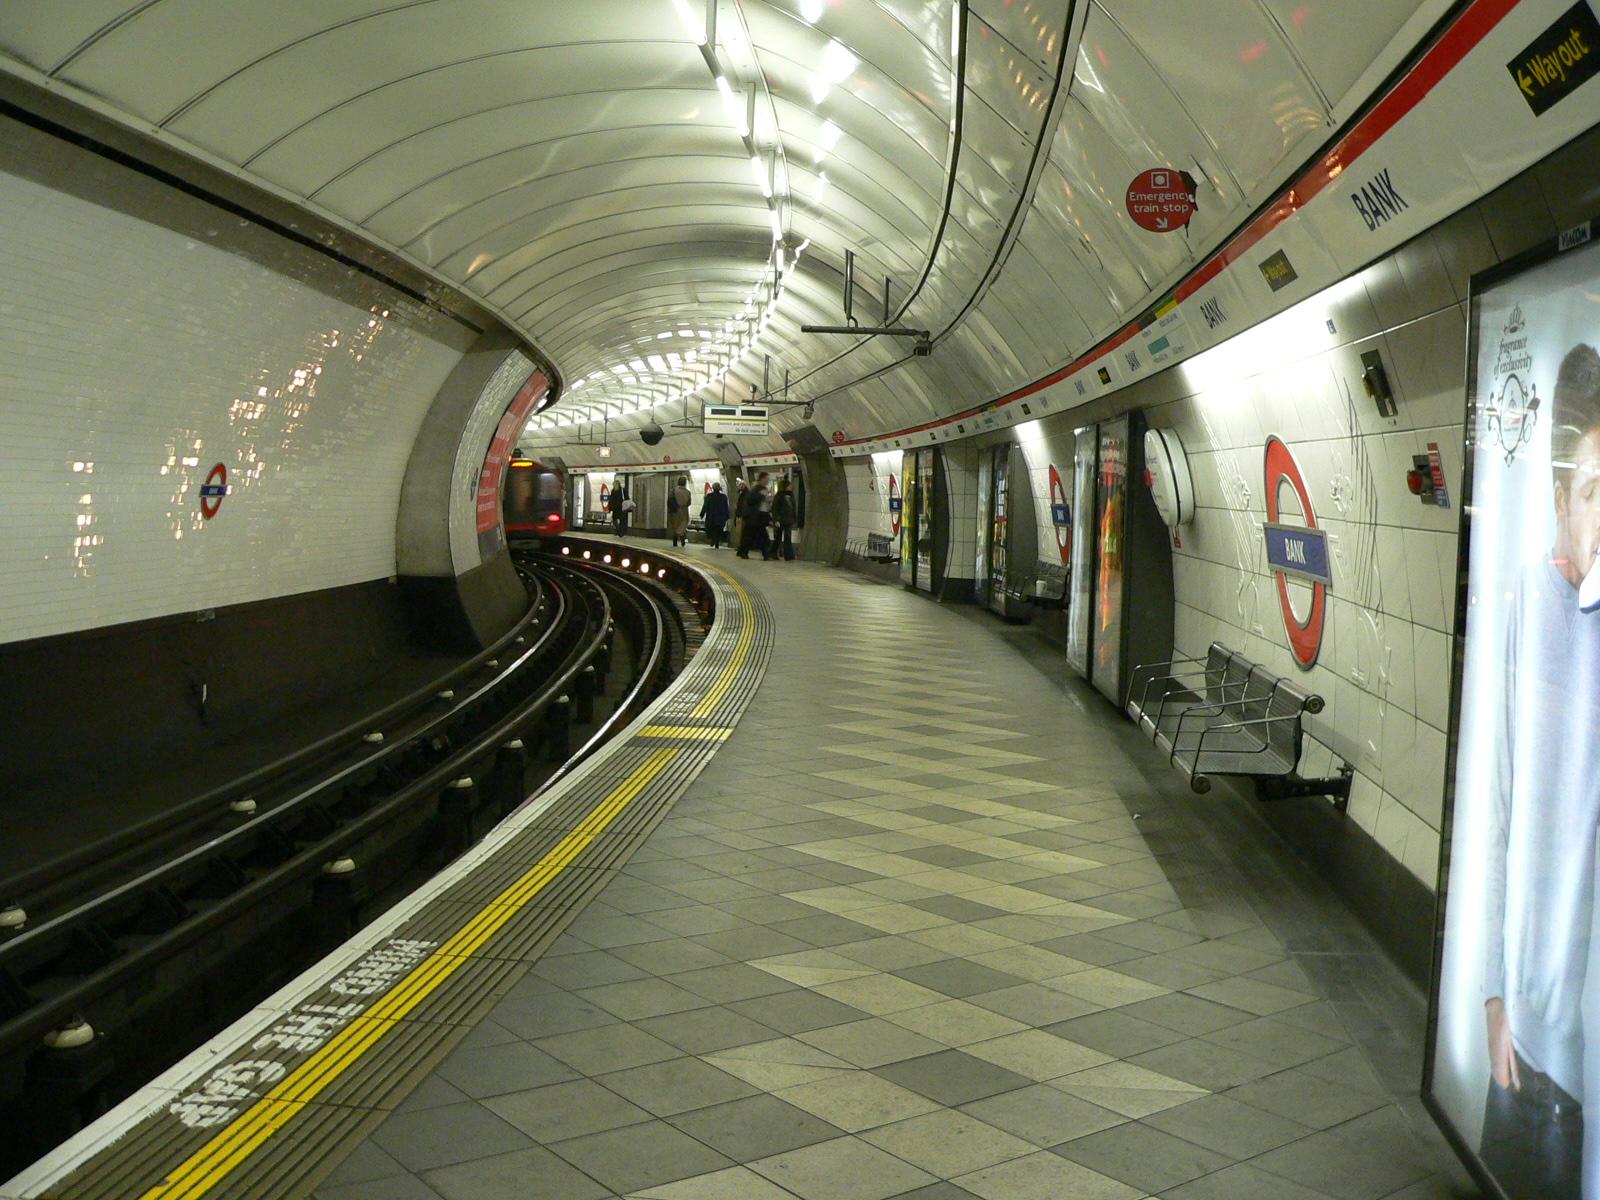 Stacja London_Underground_Central_Line_at_Bank_station_2005-12-10_02